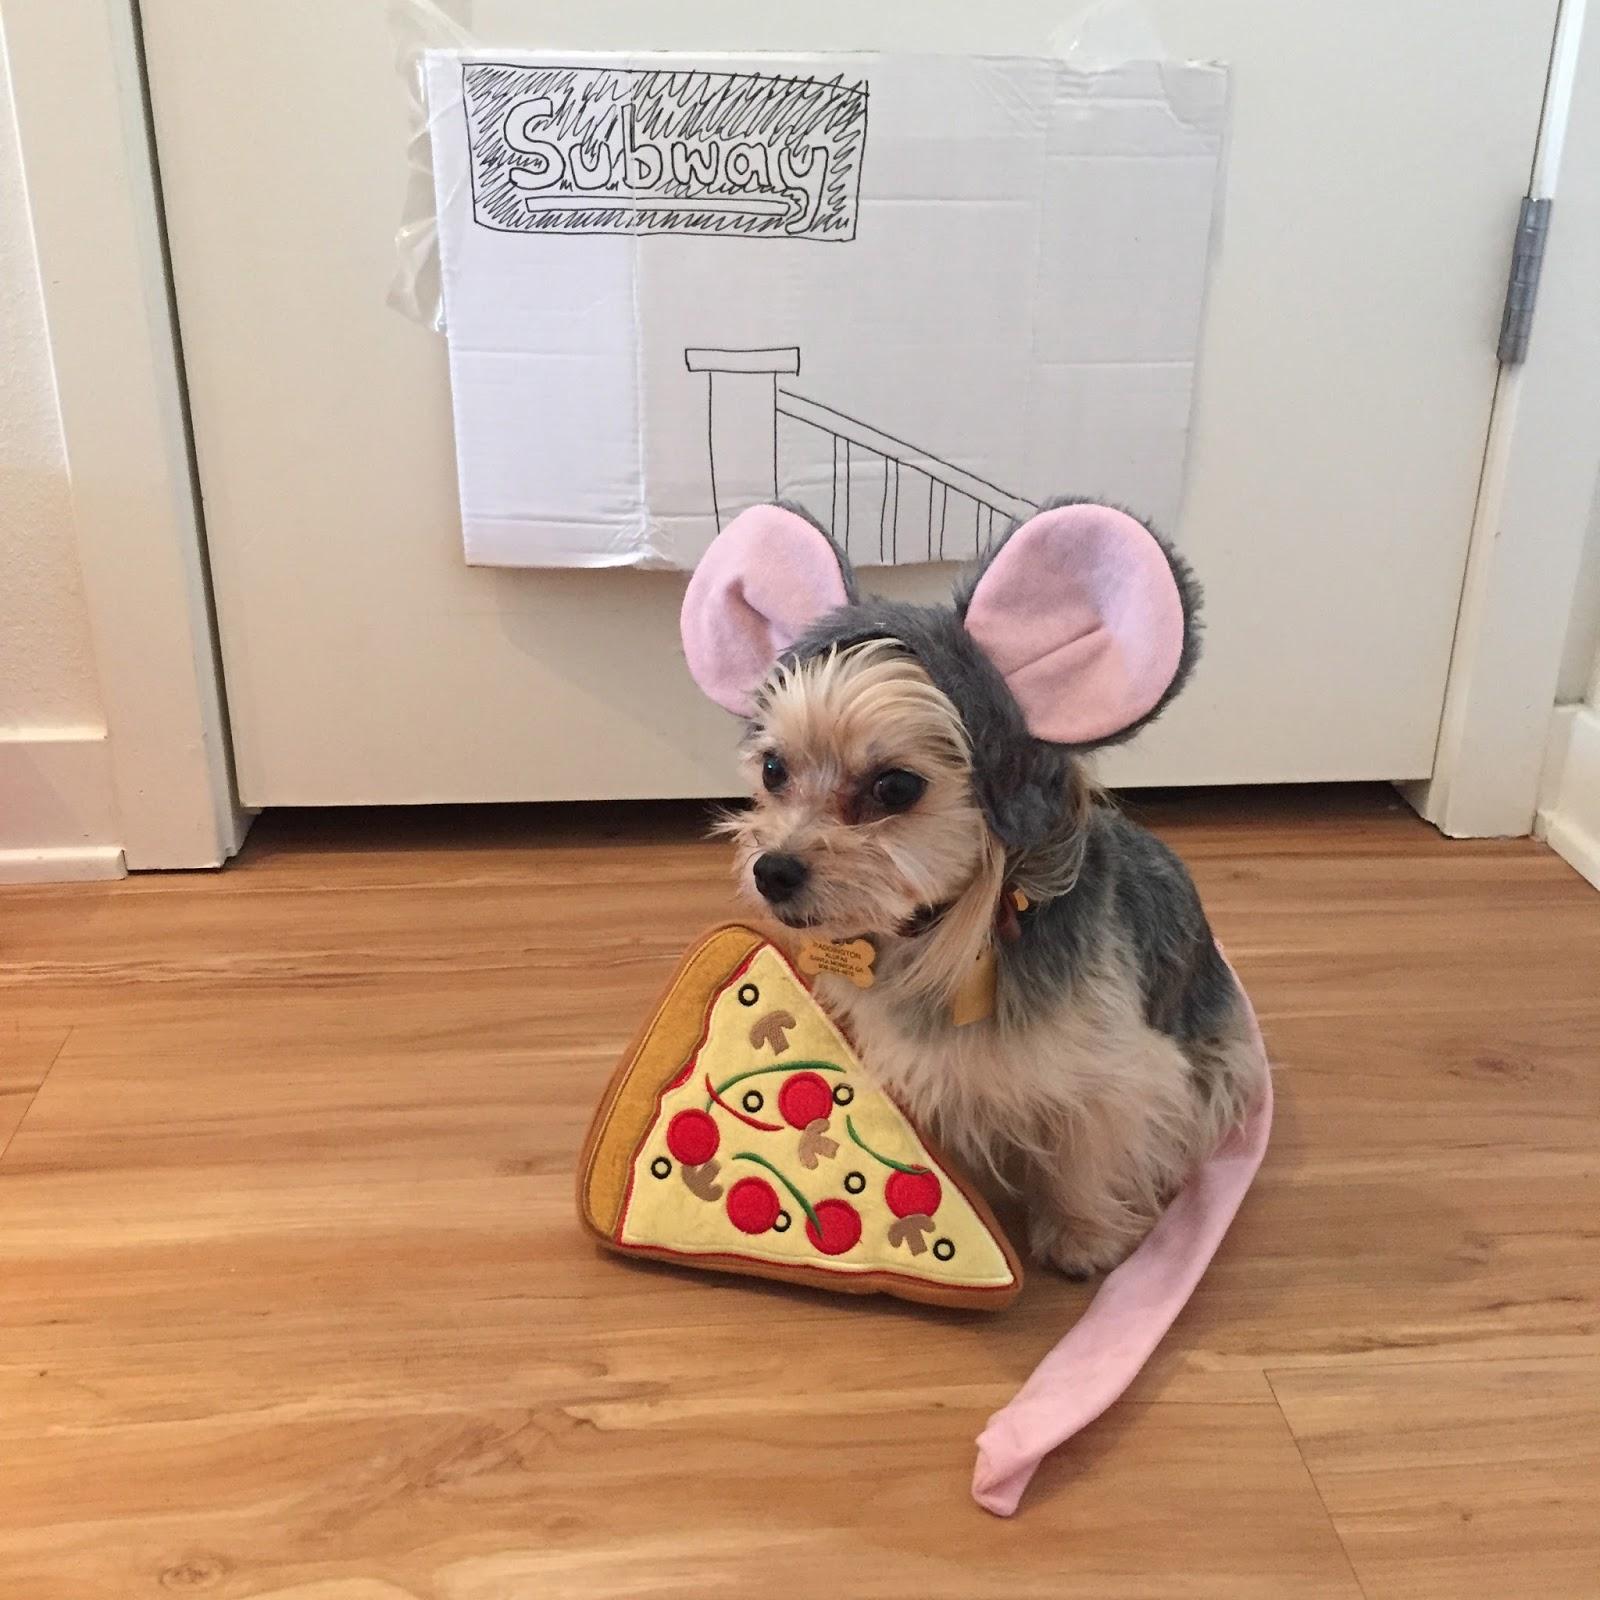 Barkzilla: A Savvy NYC Dog Blog: Pizza Rat Dog Costume!